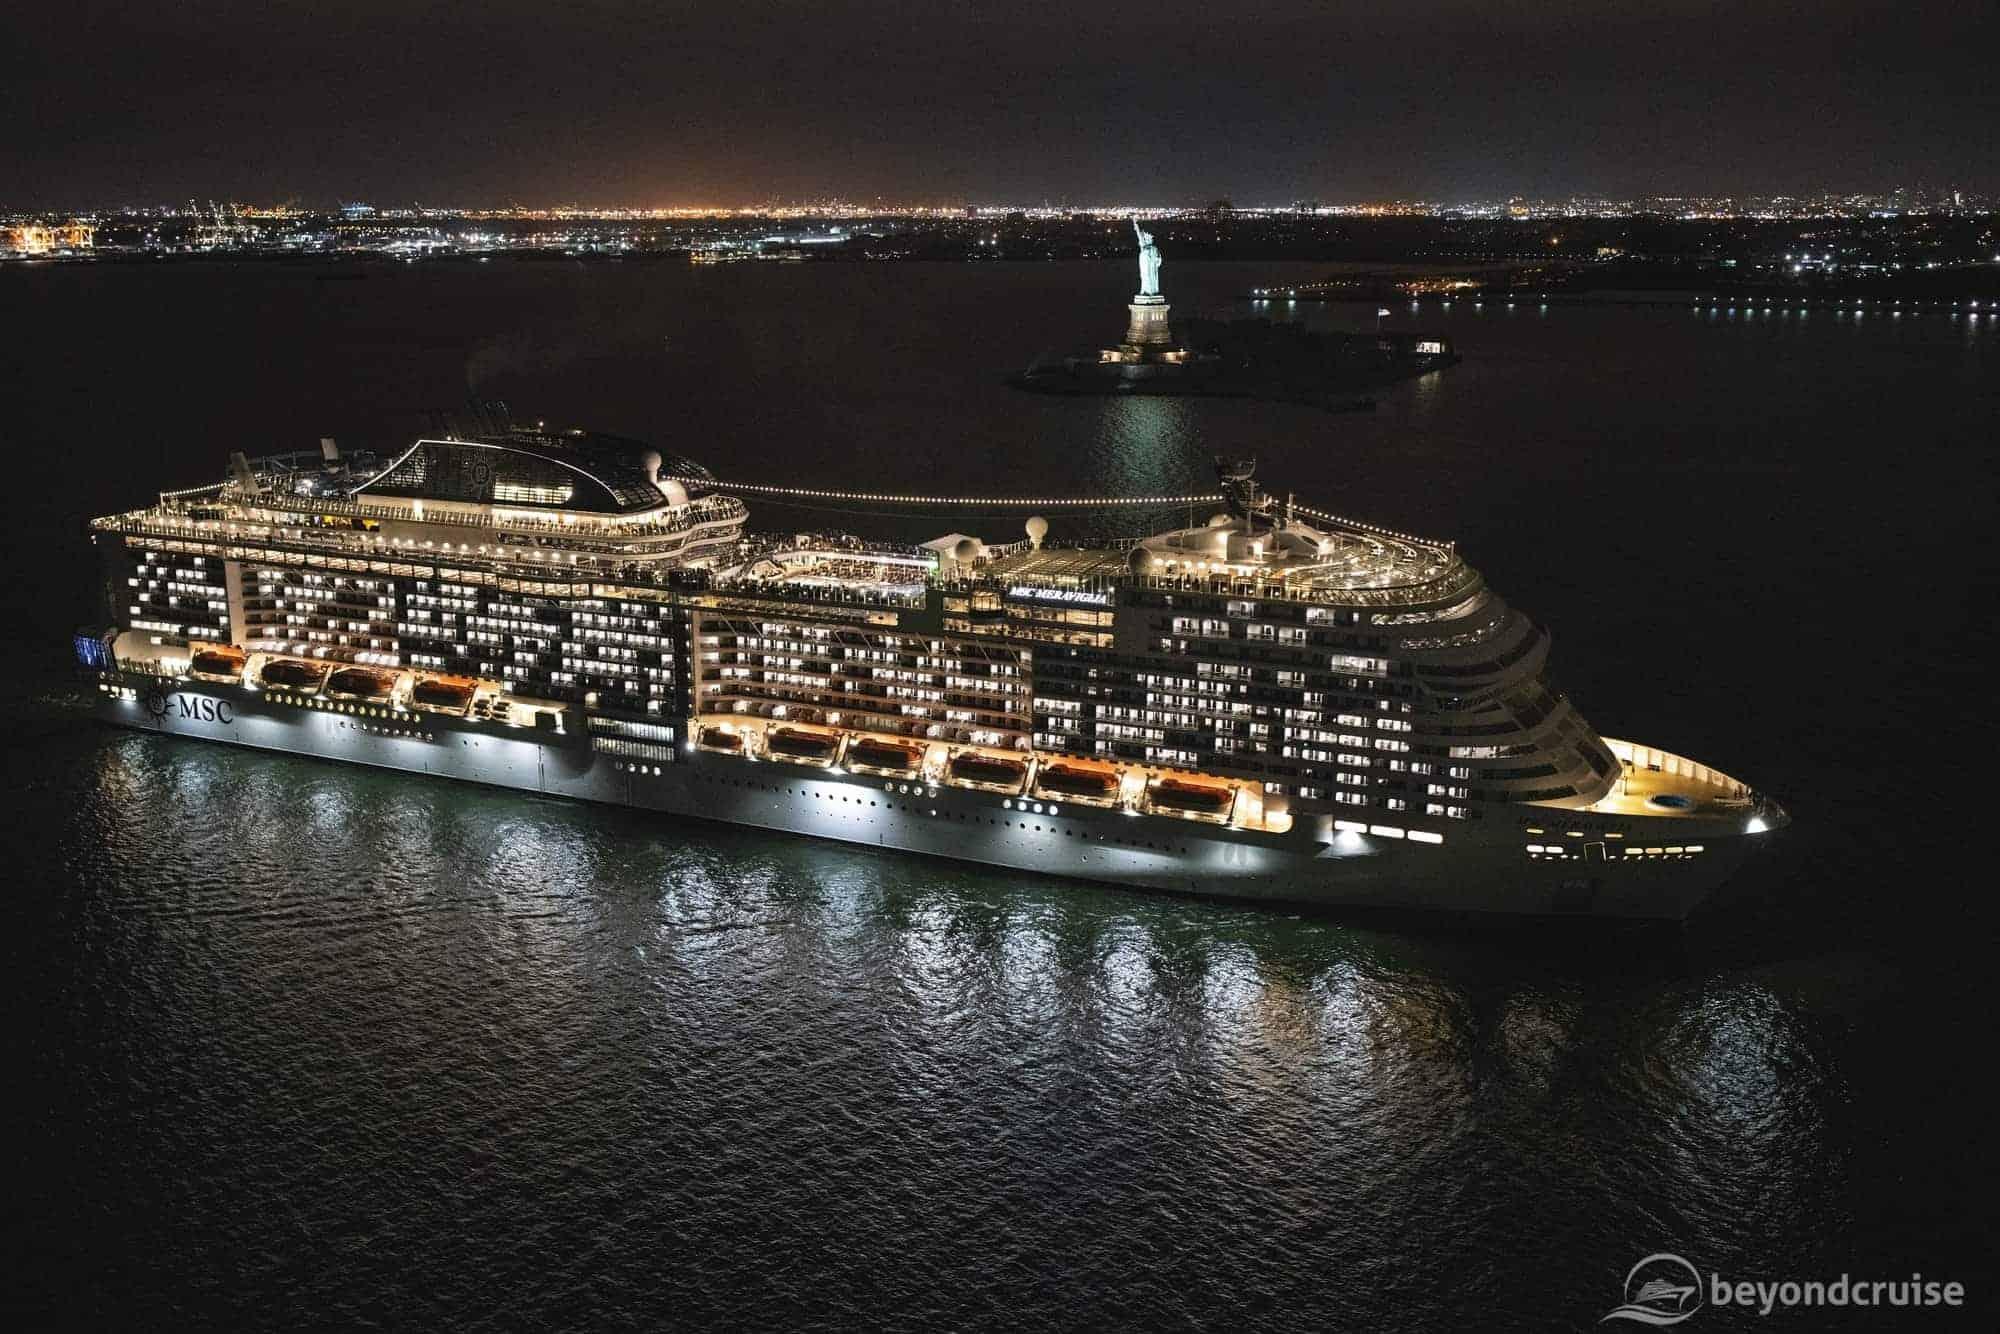 MSC Meraviglia makes her maiden call into New York